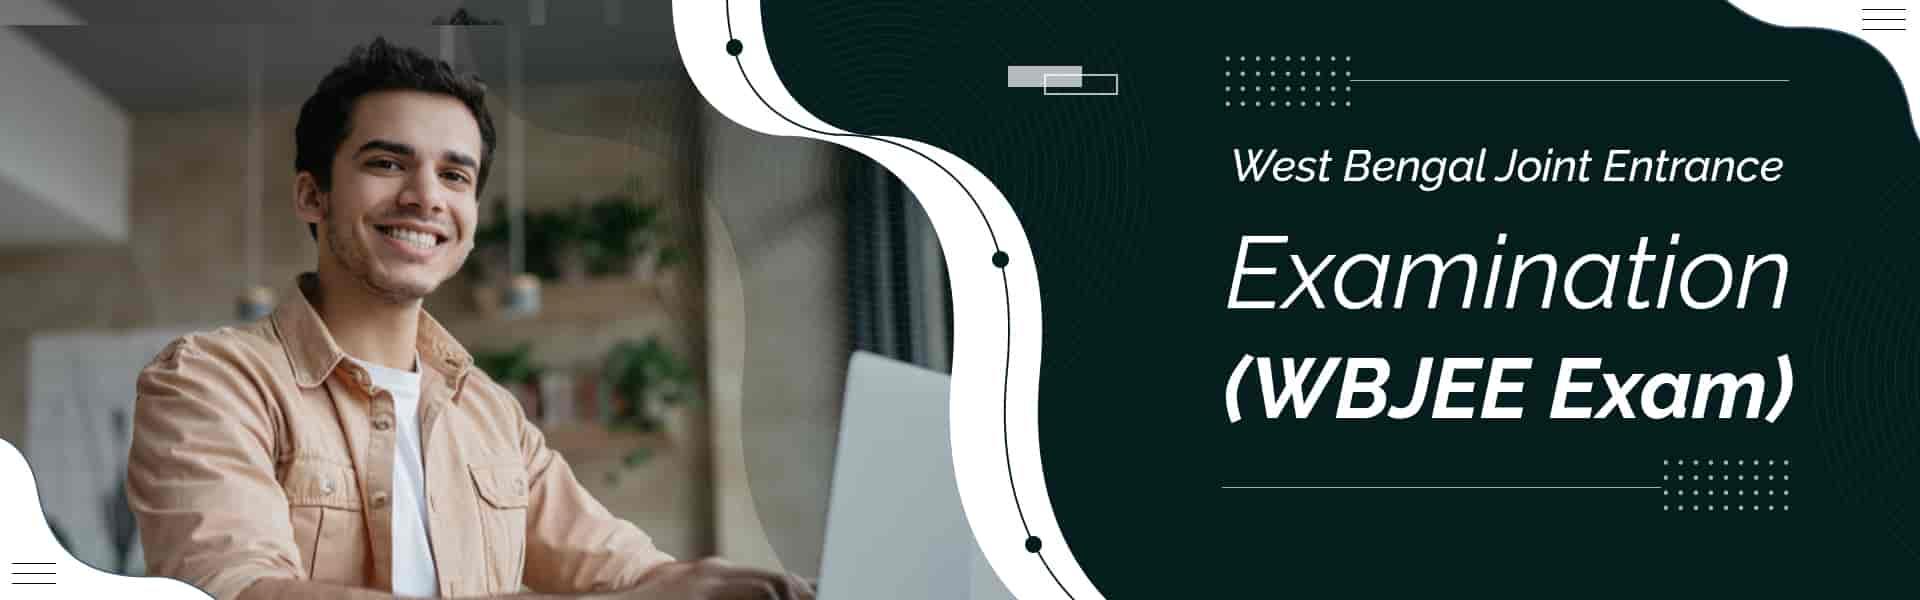 West Bengal Joint Entrance Examination (WBJEE Exam)